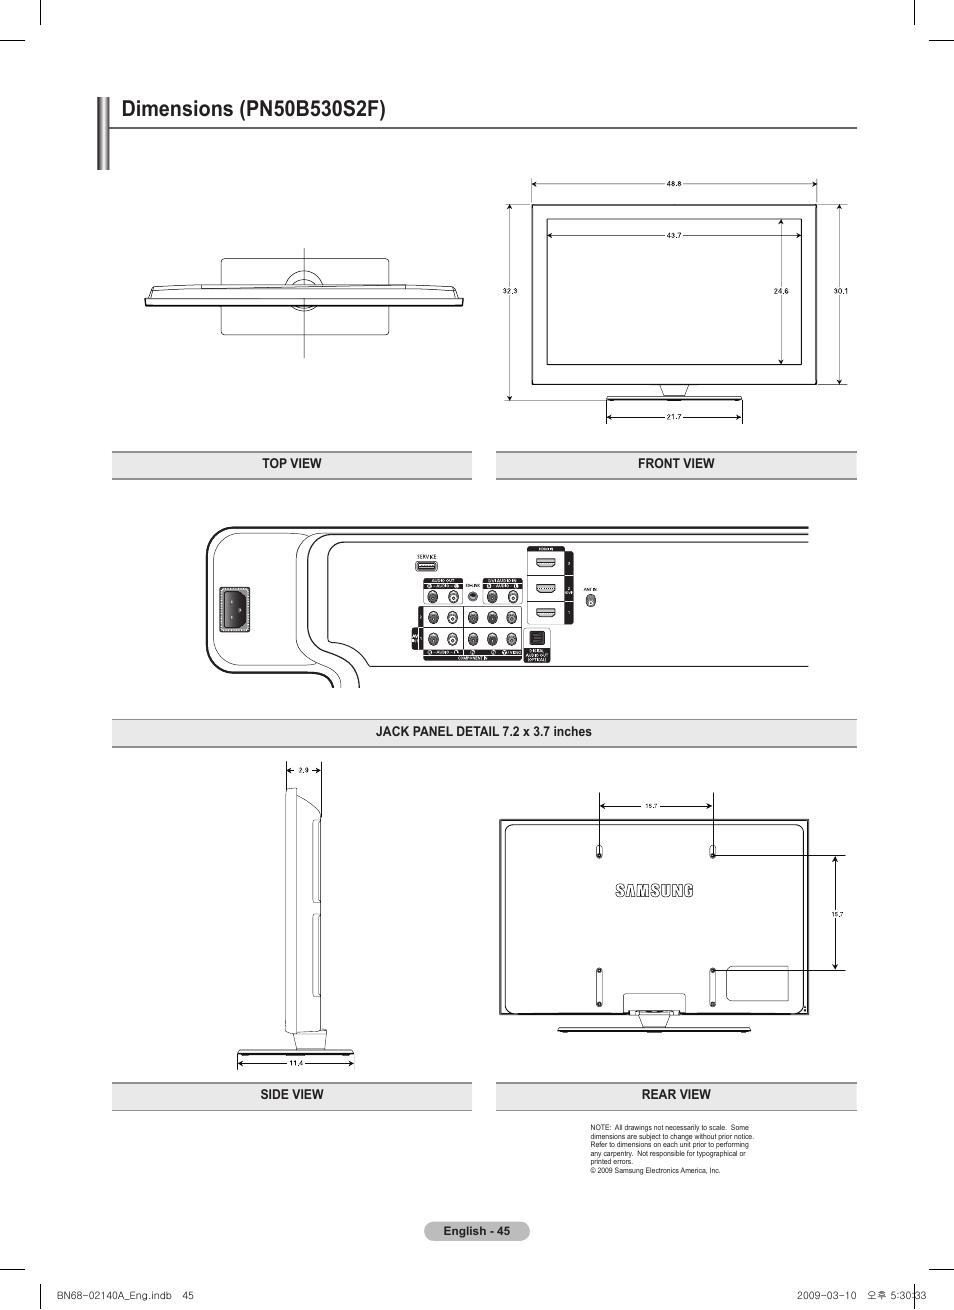 Dimensions pn50b5 0s f samsung pn58b530s2fxza user manual dimensions pn50b5 0s f samsung pn58b530s2fxza user manual page 45 92 sciox Gallery